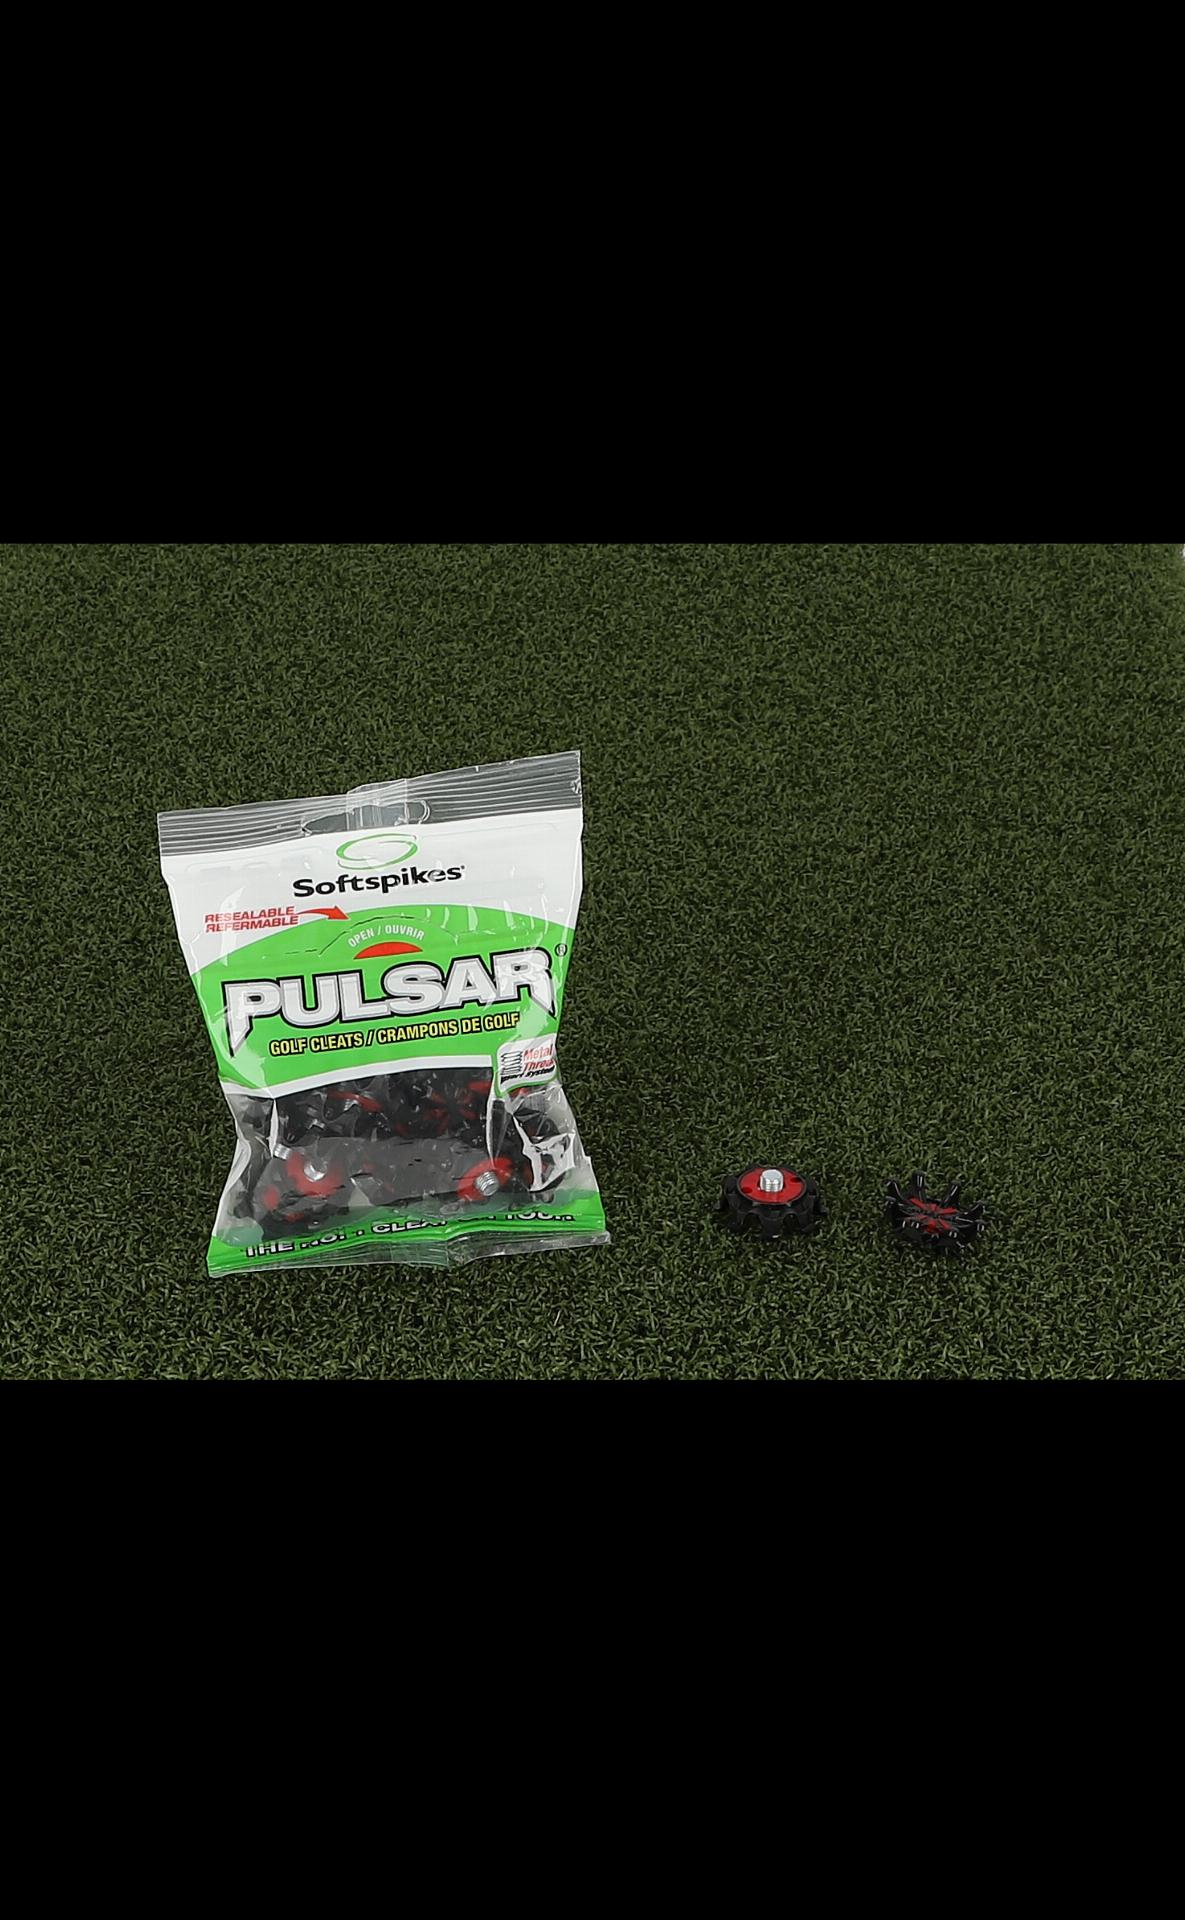 Softspikes  - Pulsar 6mm Metall Gewinde